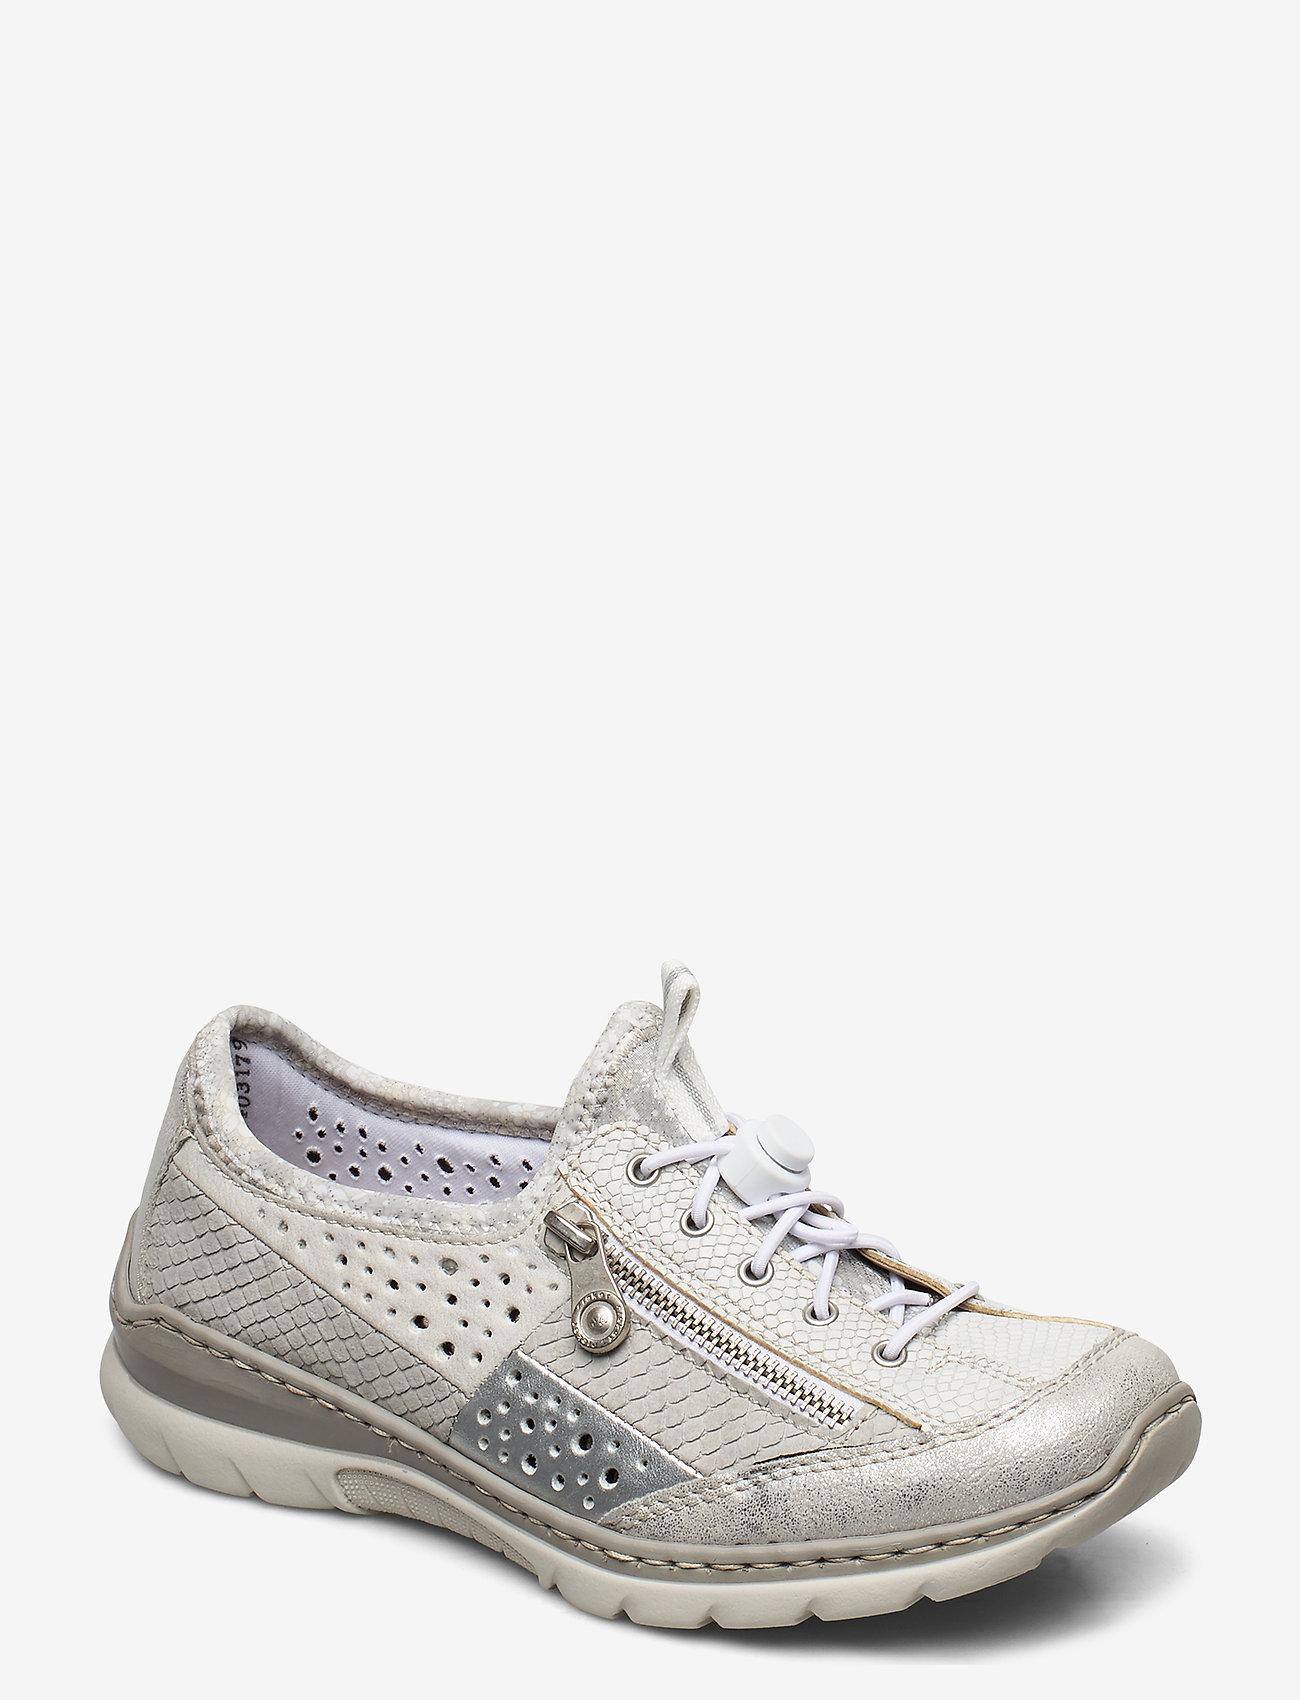 Rieker - L3297-91 - low top sneakers - metallic